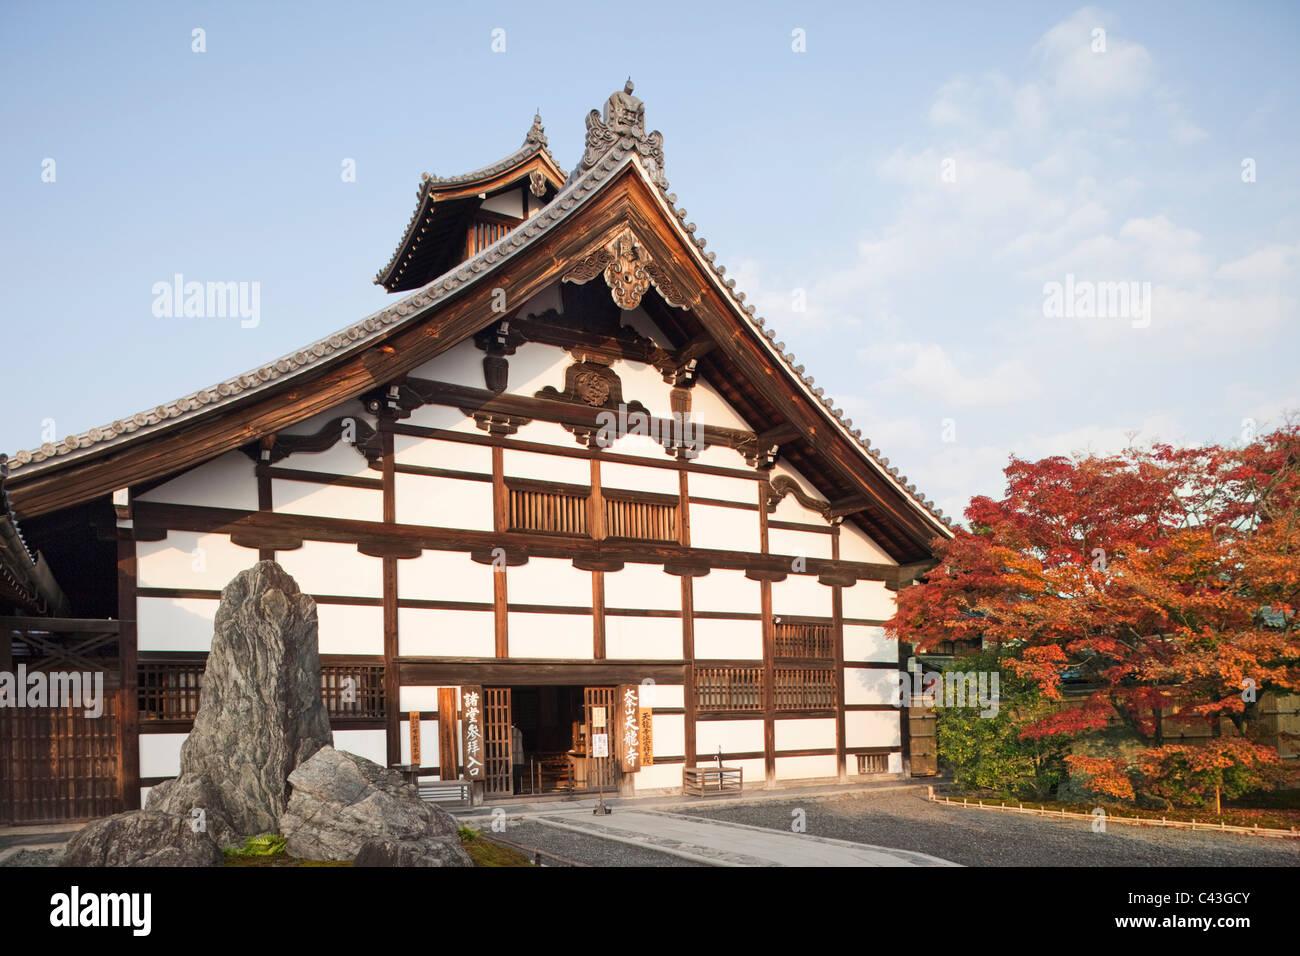 Tenryu-ji Temple - Gaijin Go Japan